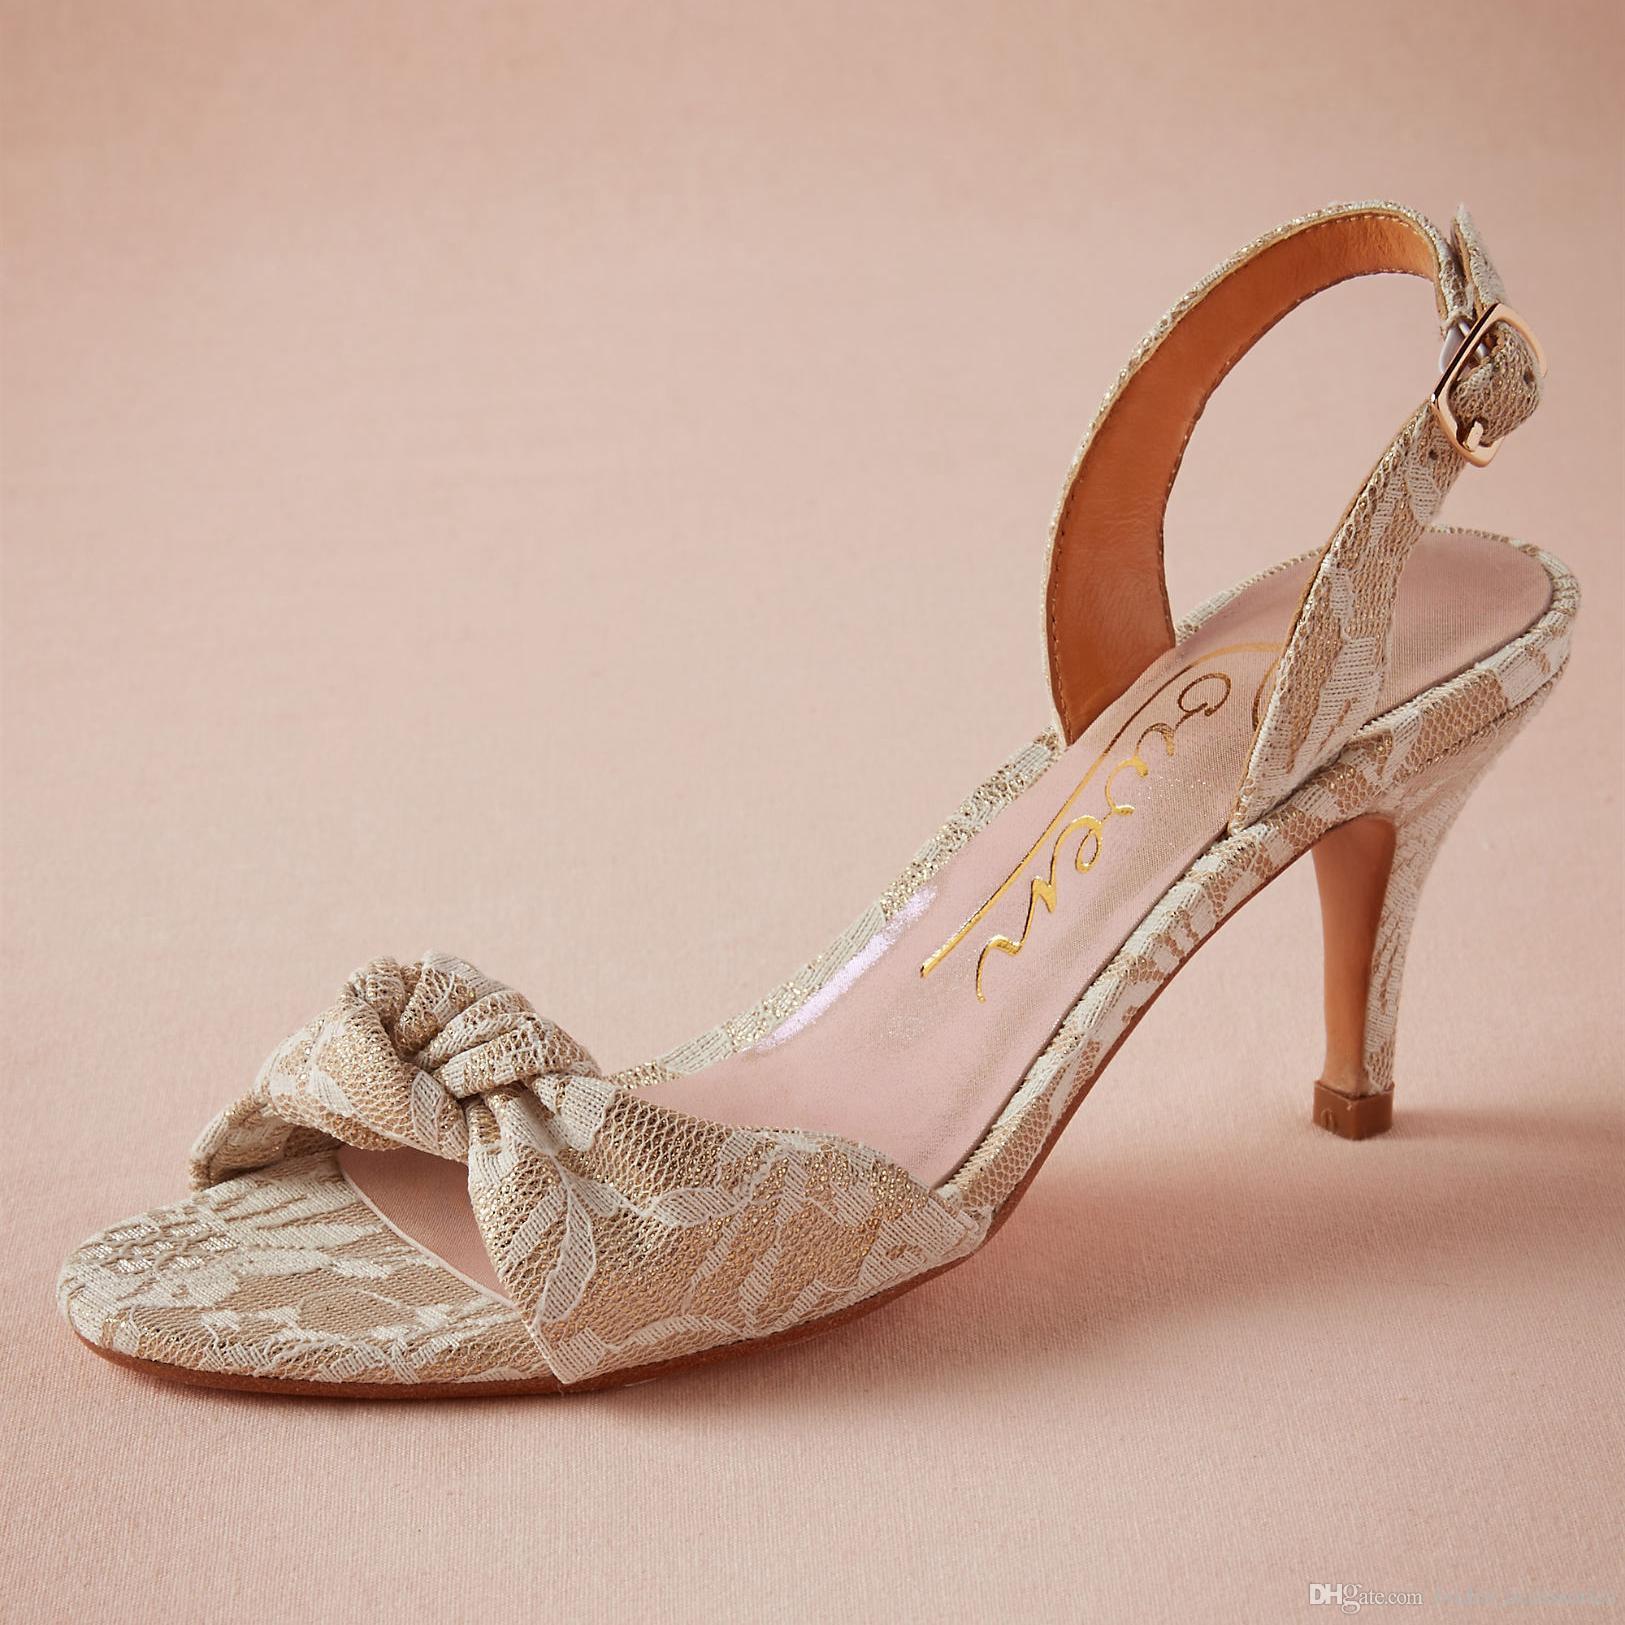 Handmade Lace Wedding Shoes Open Toe Sandals Specter Heels Party Dance Pumps  Sandals 3 Kitten Heels Designer Bridal Pump Shoes Mischka Badgley Shoes  Navy ... 0f65d8eb6601